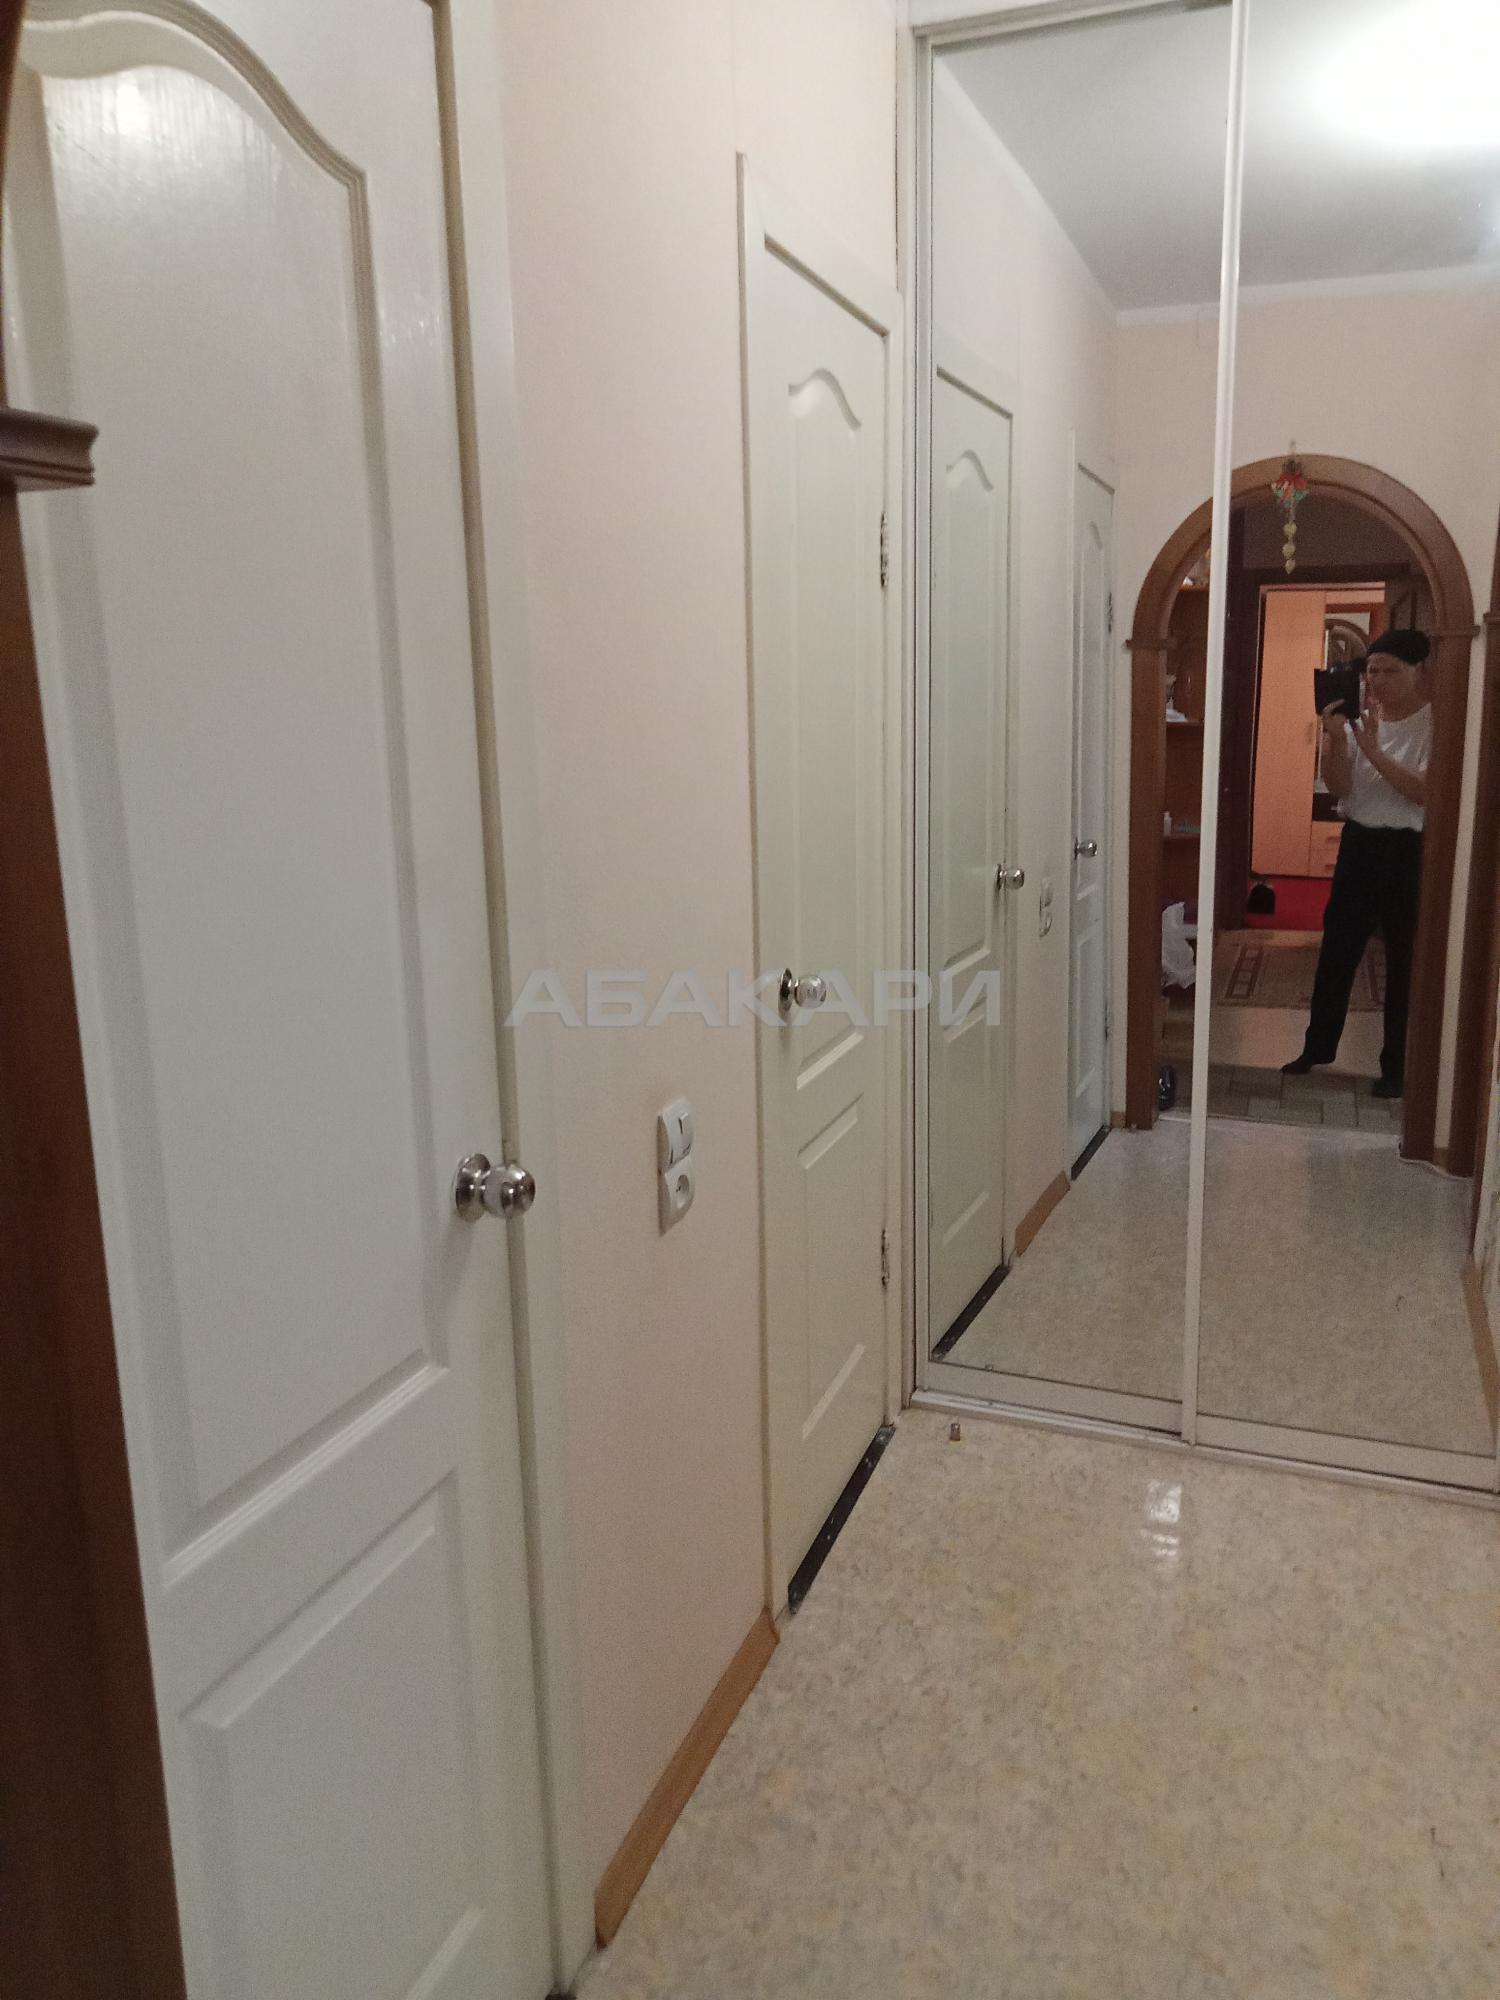 2к квартира улица Перенсона, 5А 3/16 - 53кв   26000   аренда в Красноярске фото 11